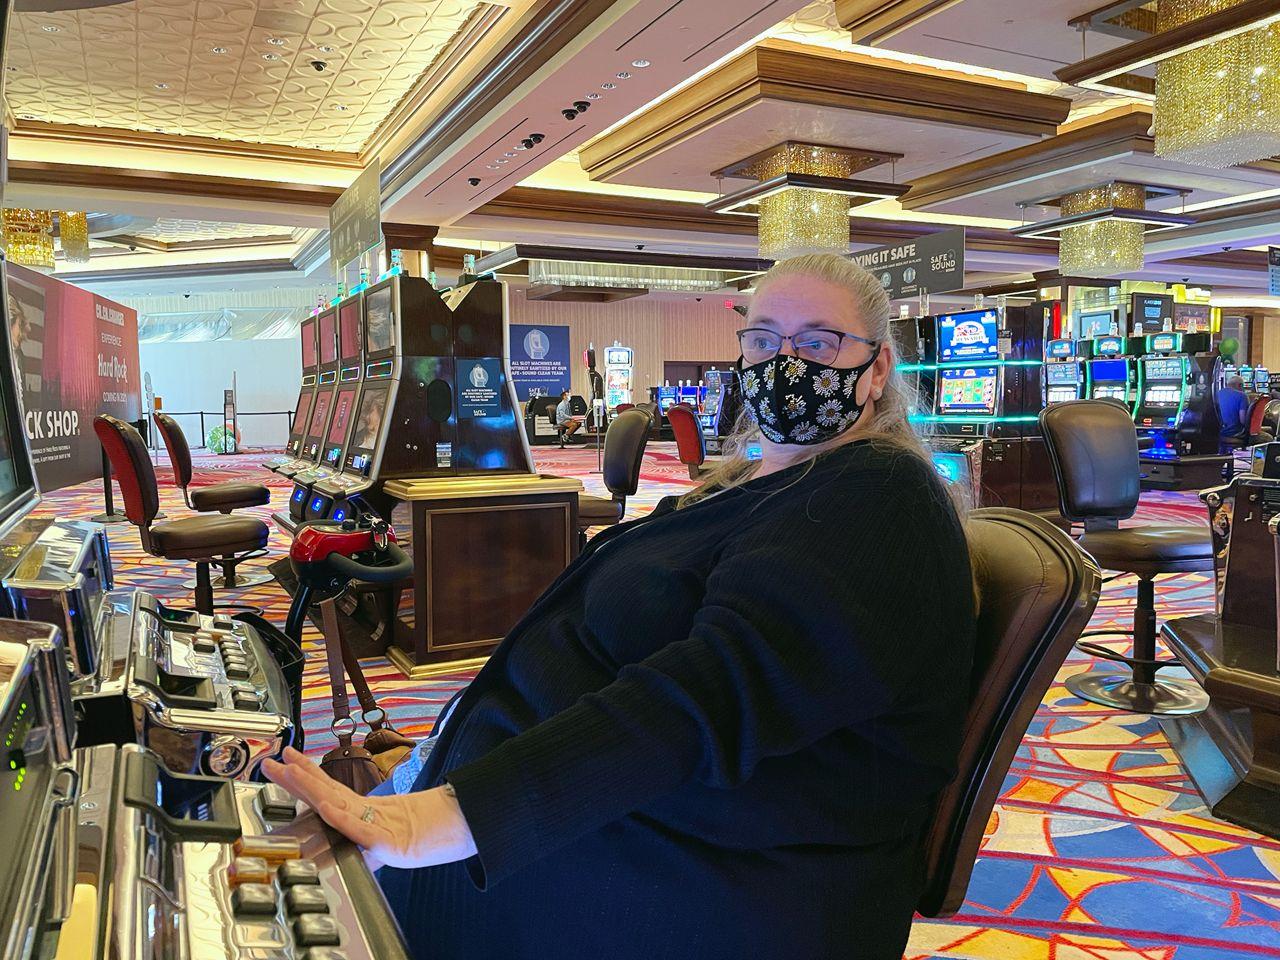 Casino patron